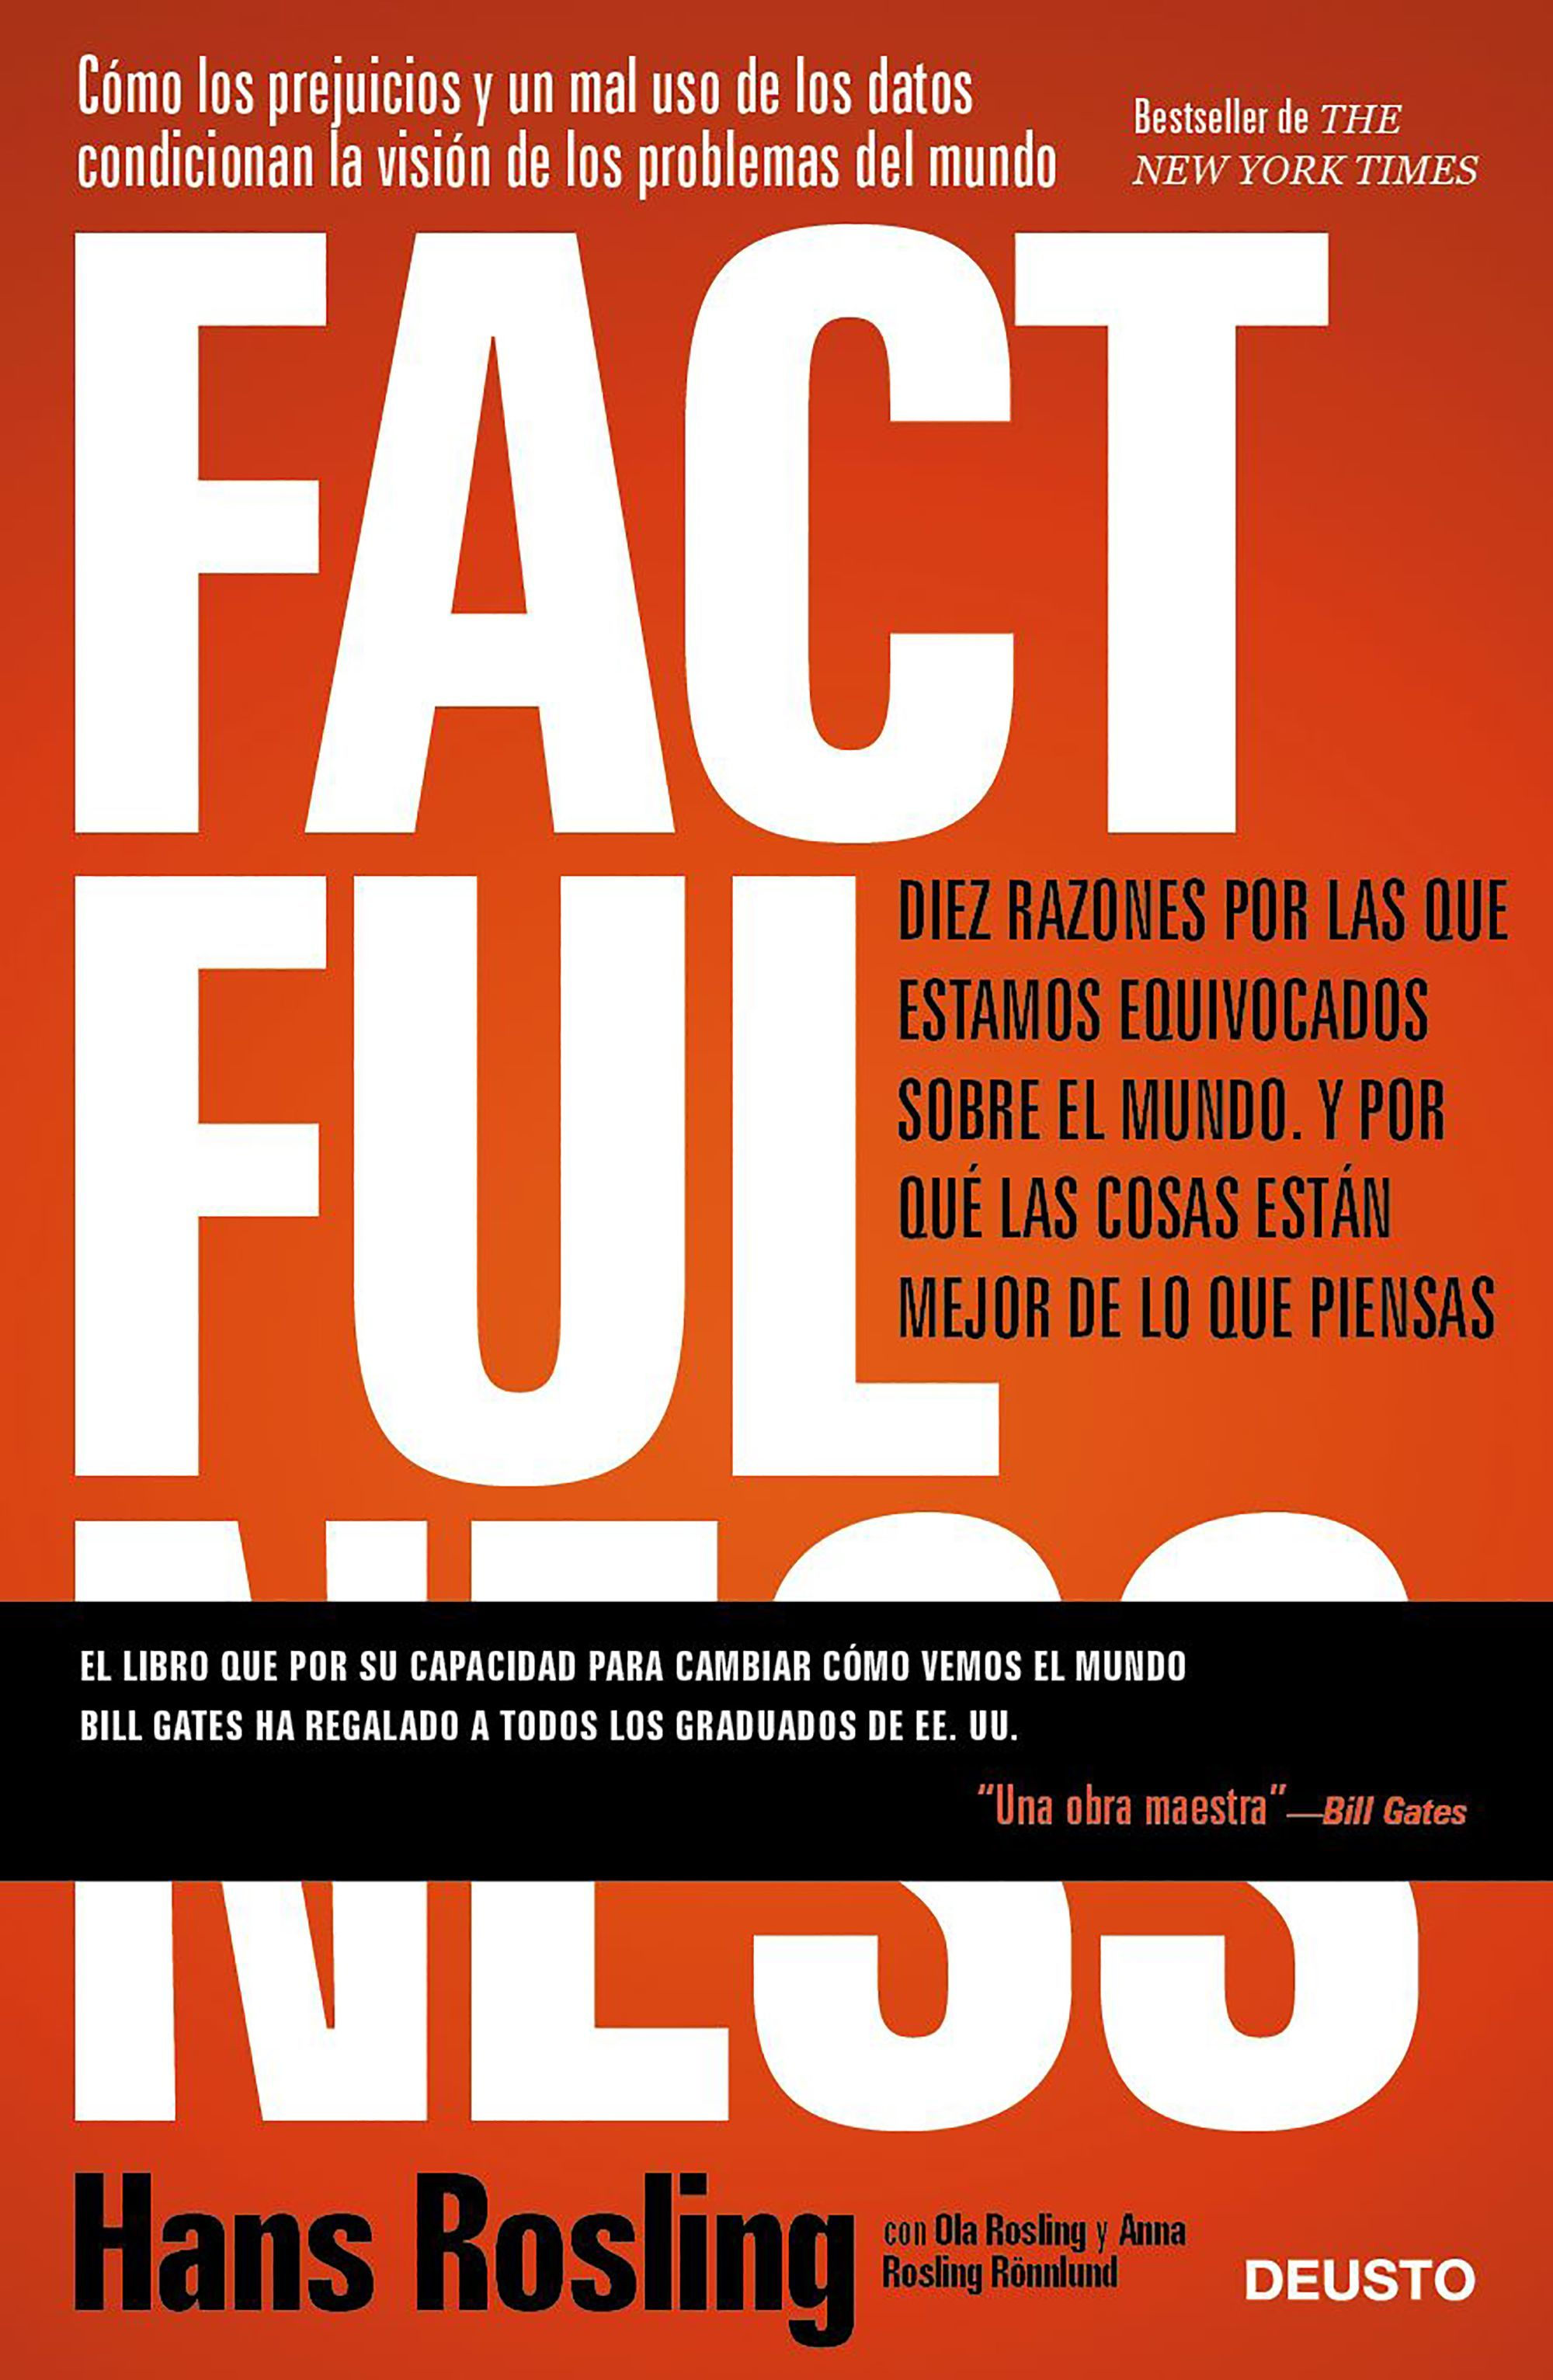 Factfulness se publica en España el 27 de noviembre.